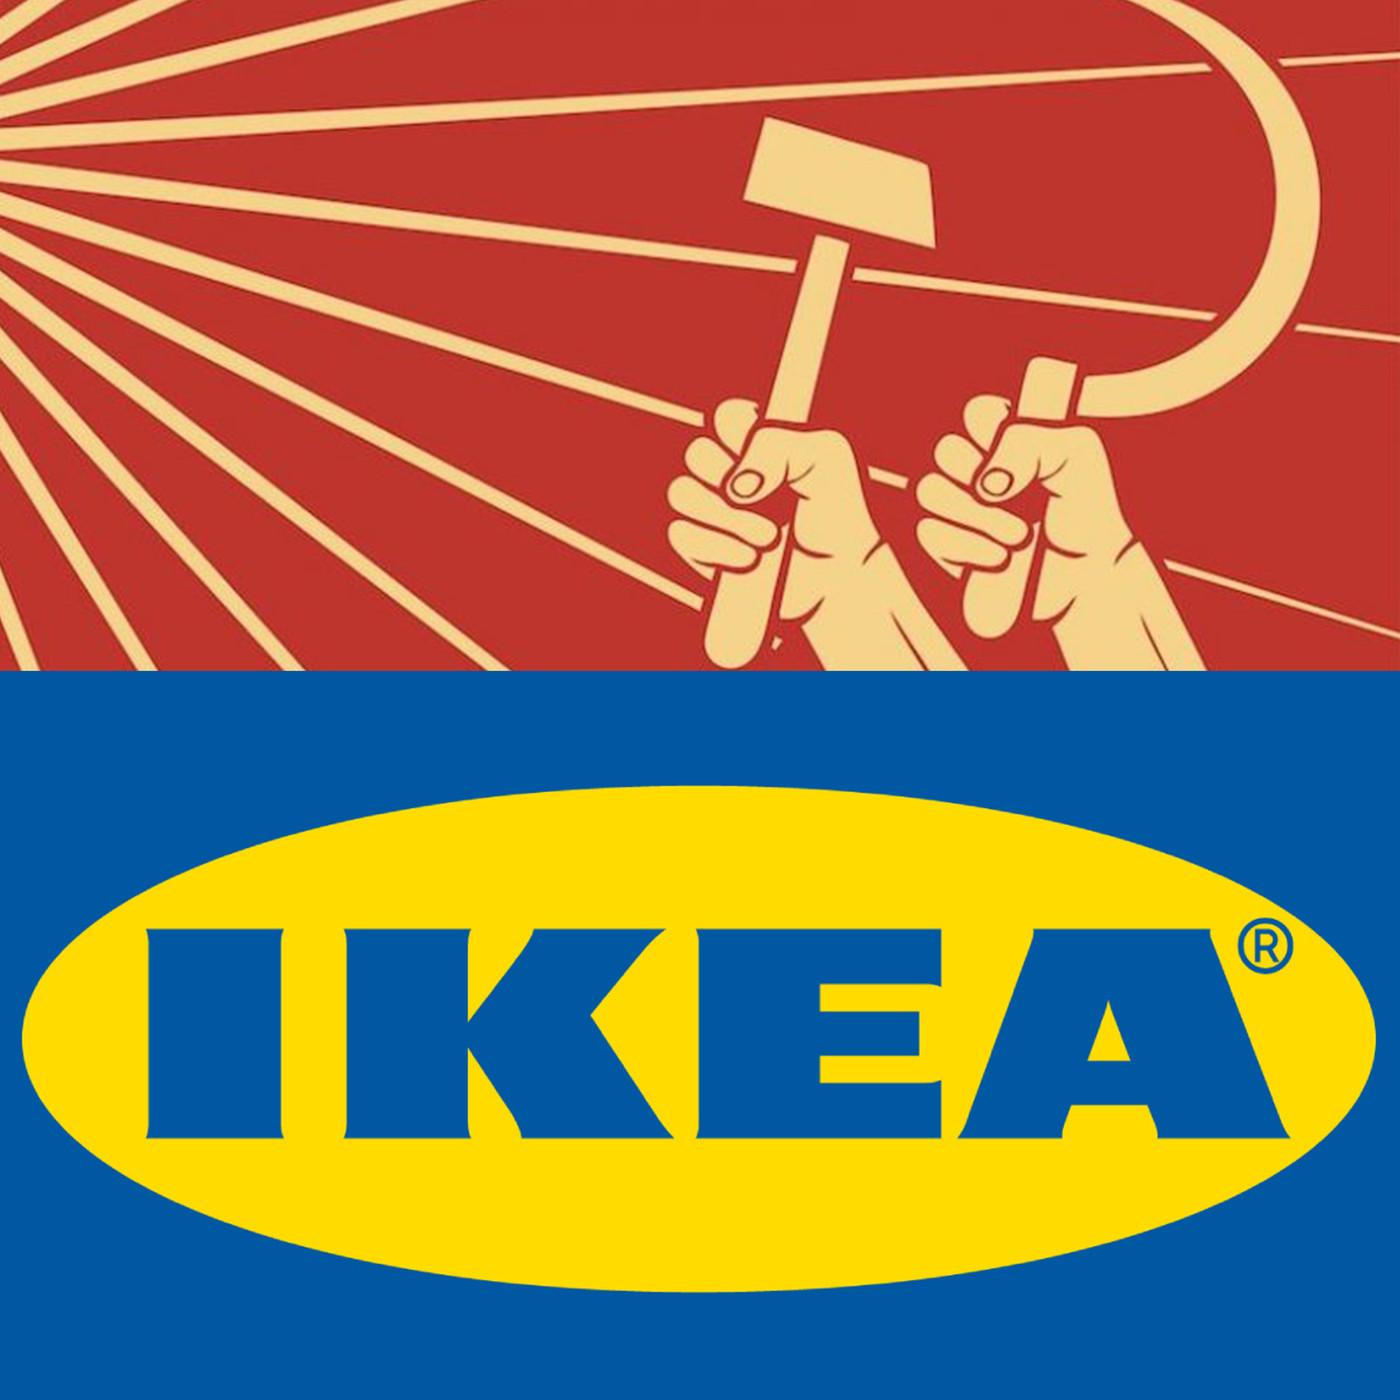 27 - RYC - Comunismo o Ikea